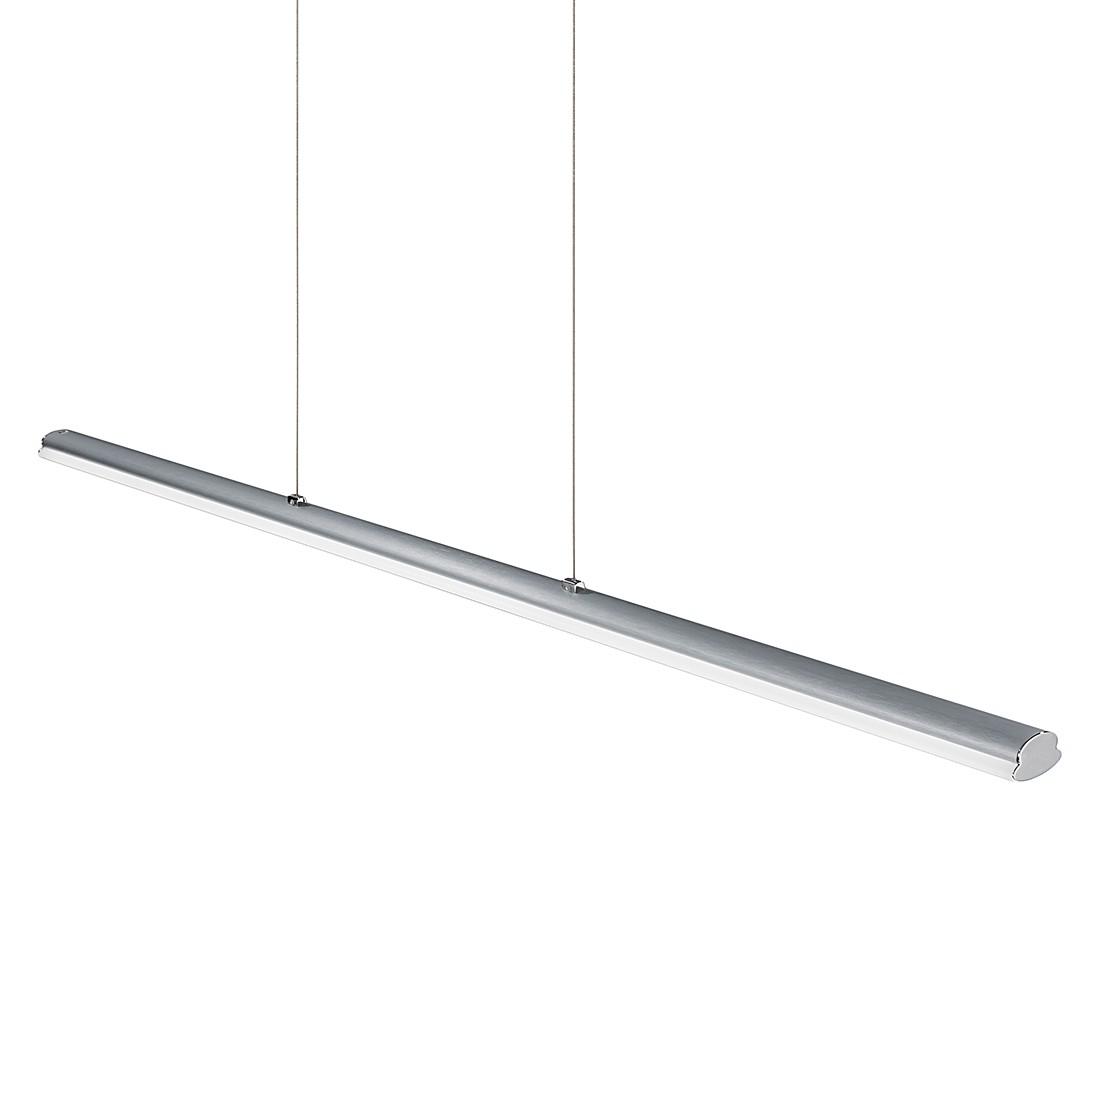 EEK A+, Pendelleuchte VENTA – Metall/Kunststoff – Silber, Helestra günstig bestellen